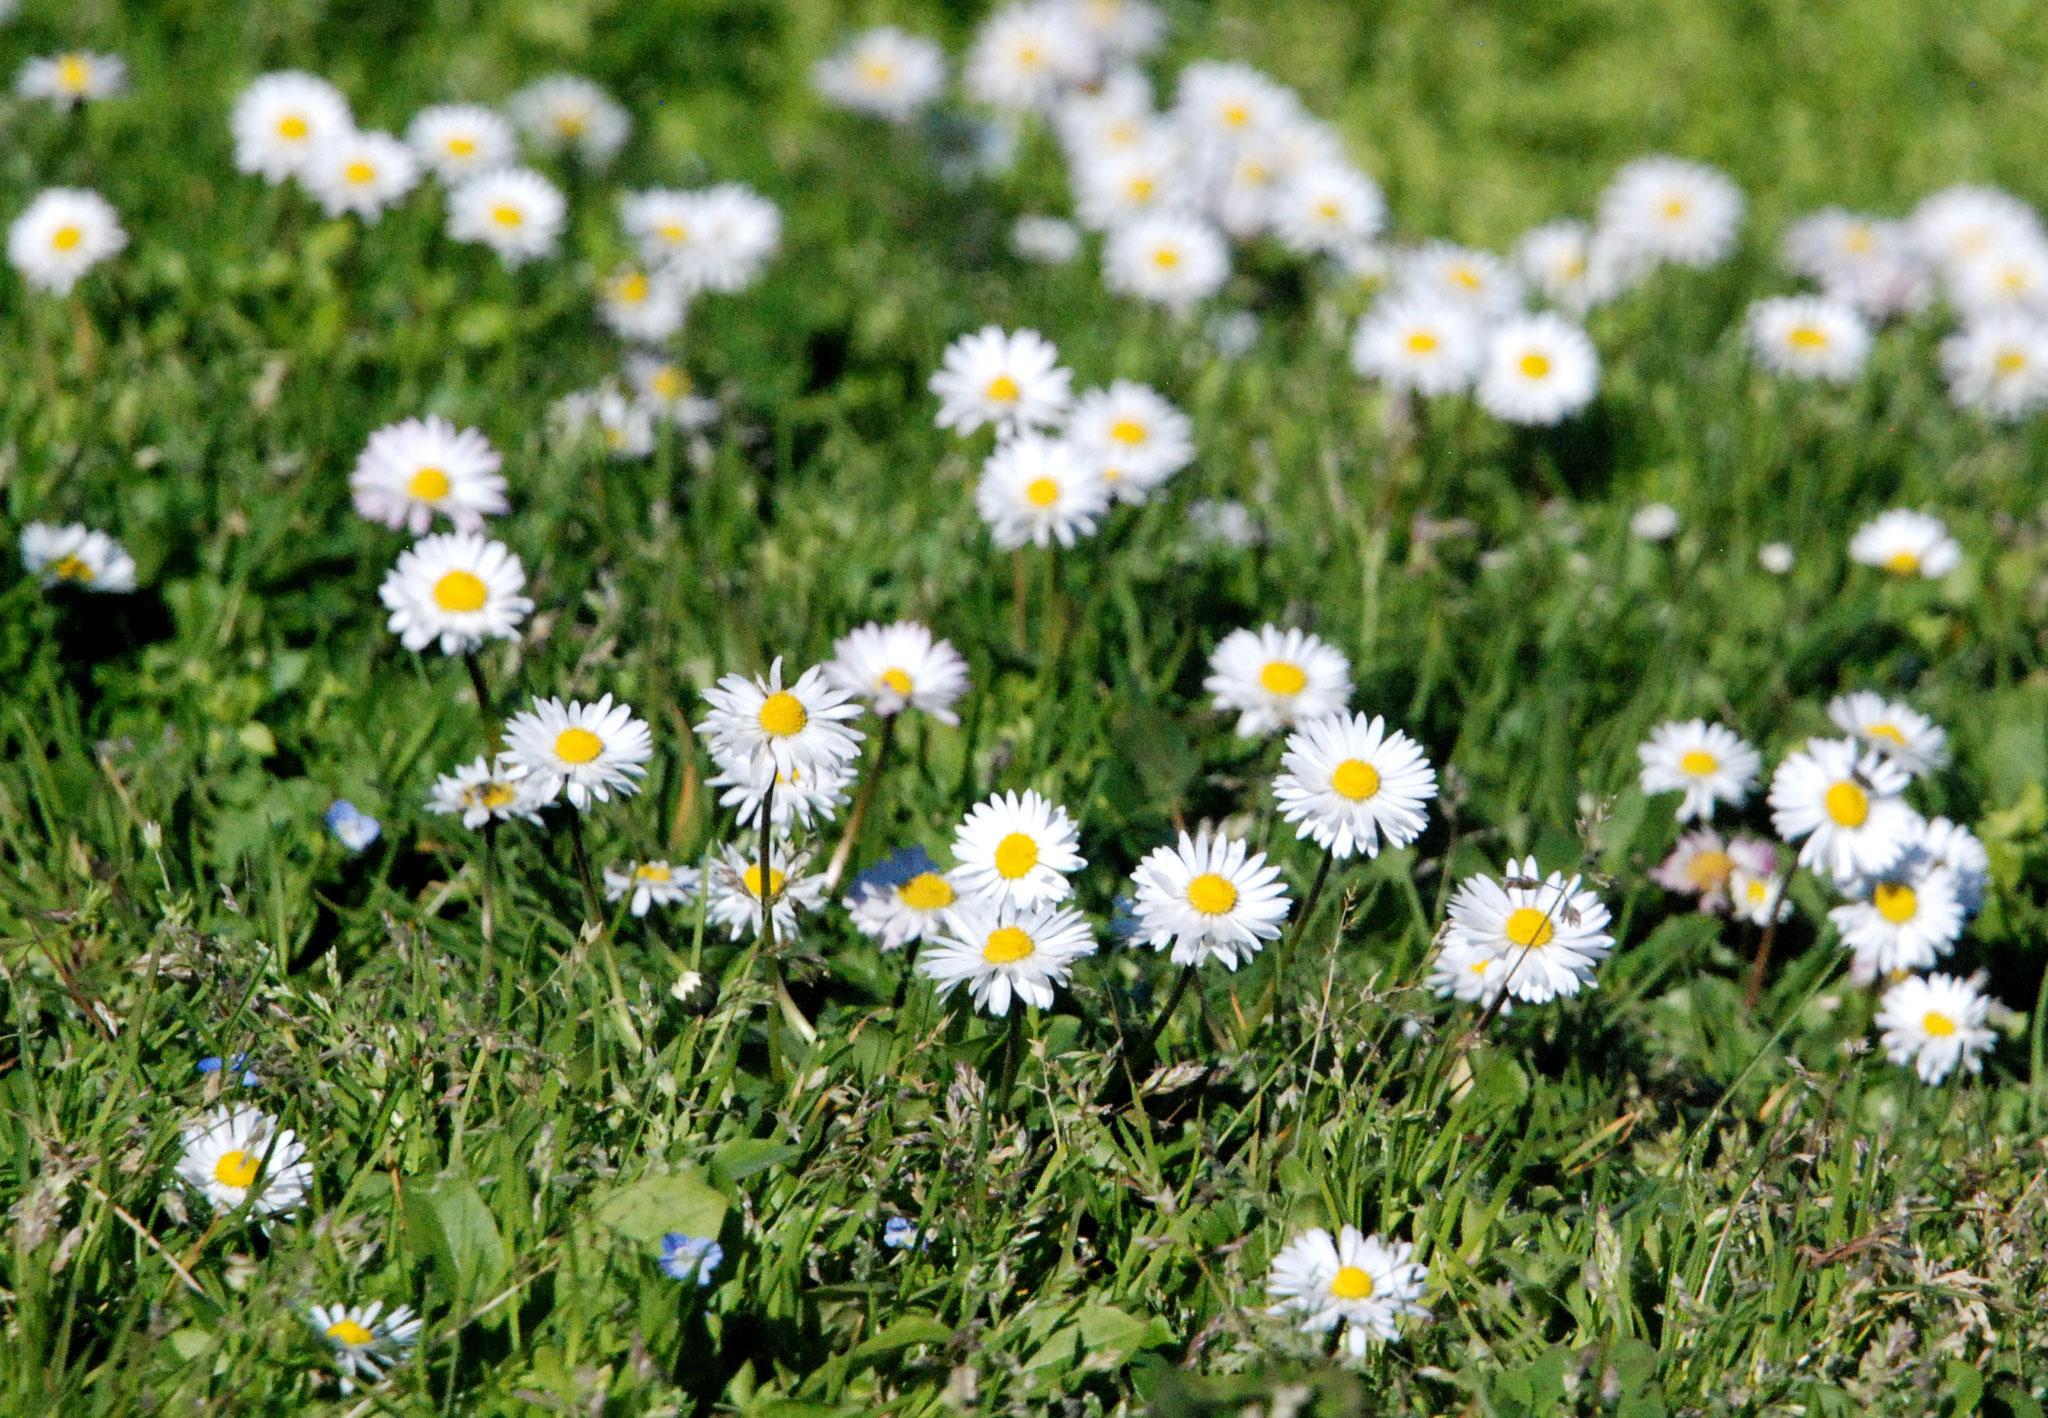 Bild 30 - Frühlingsliebe